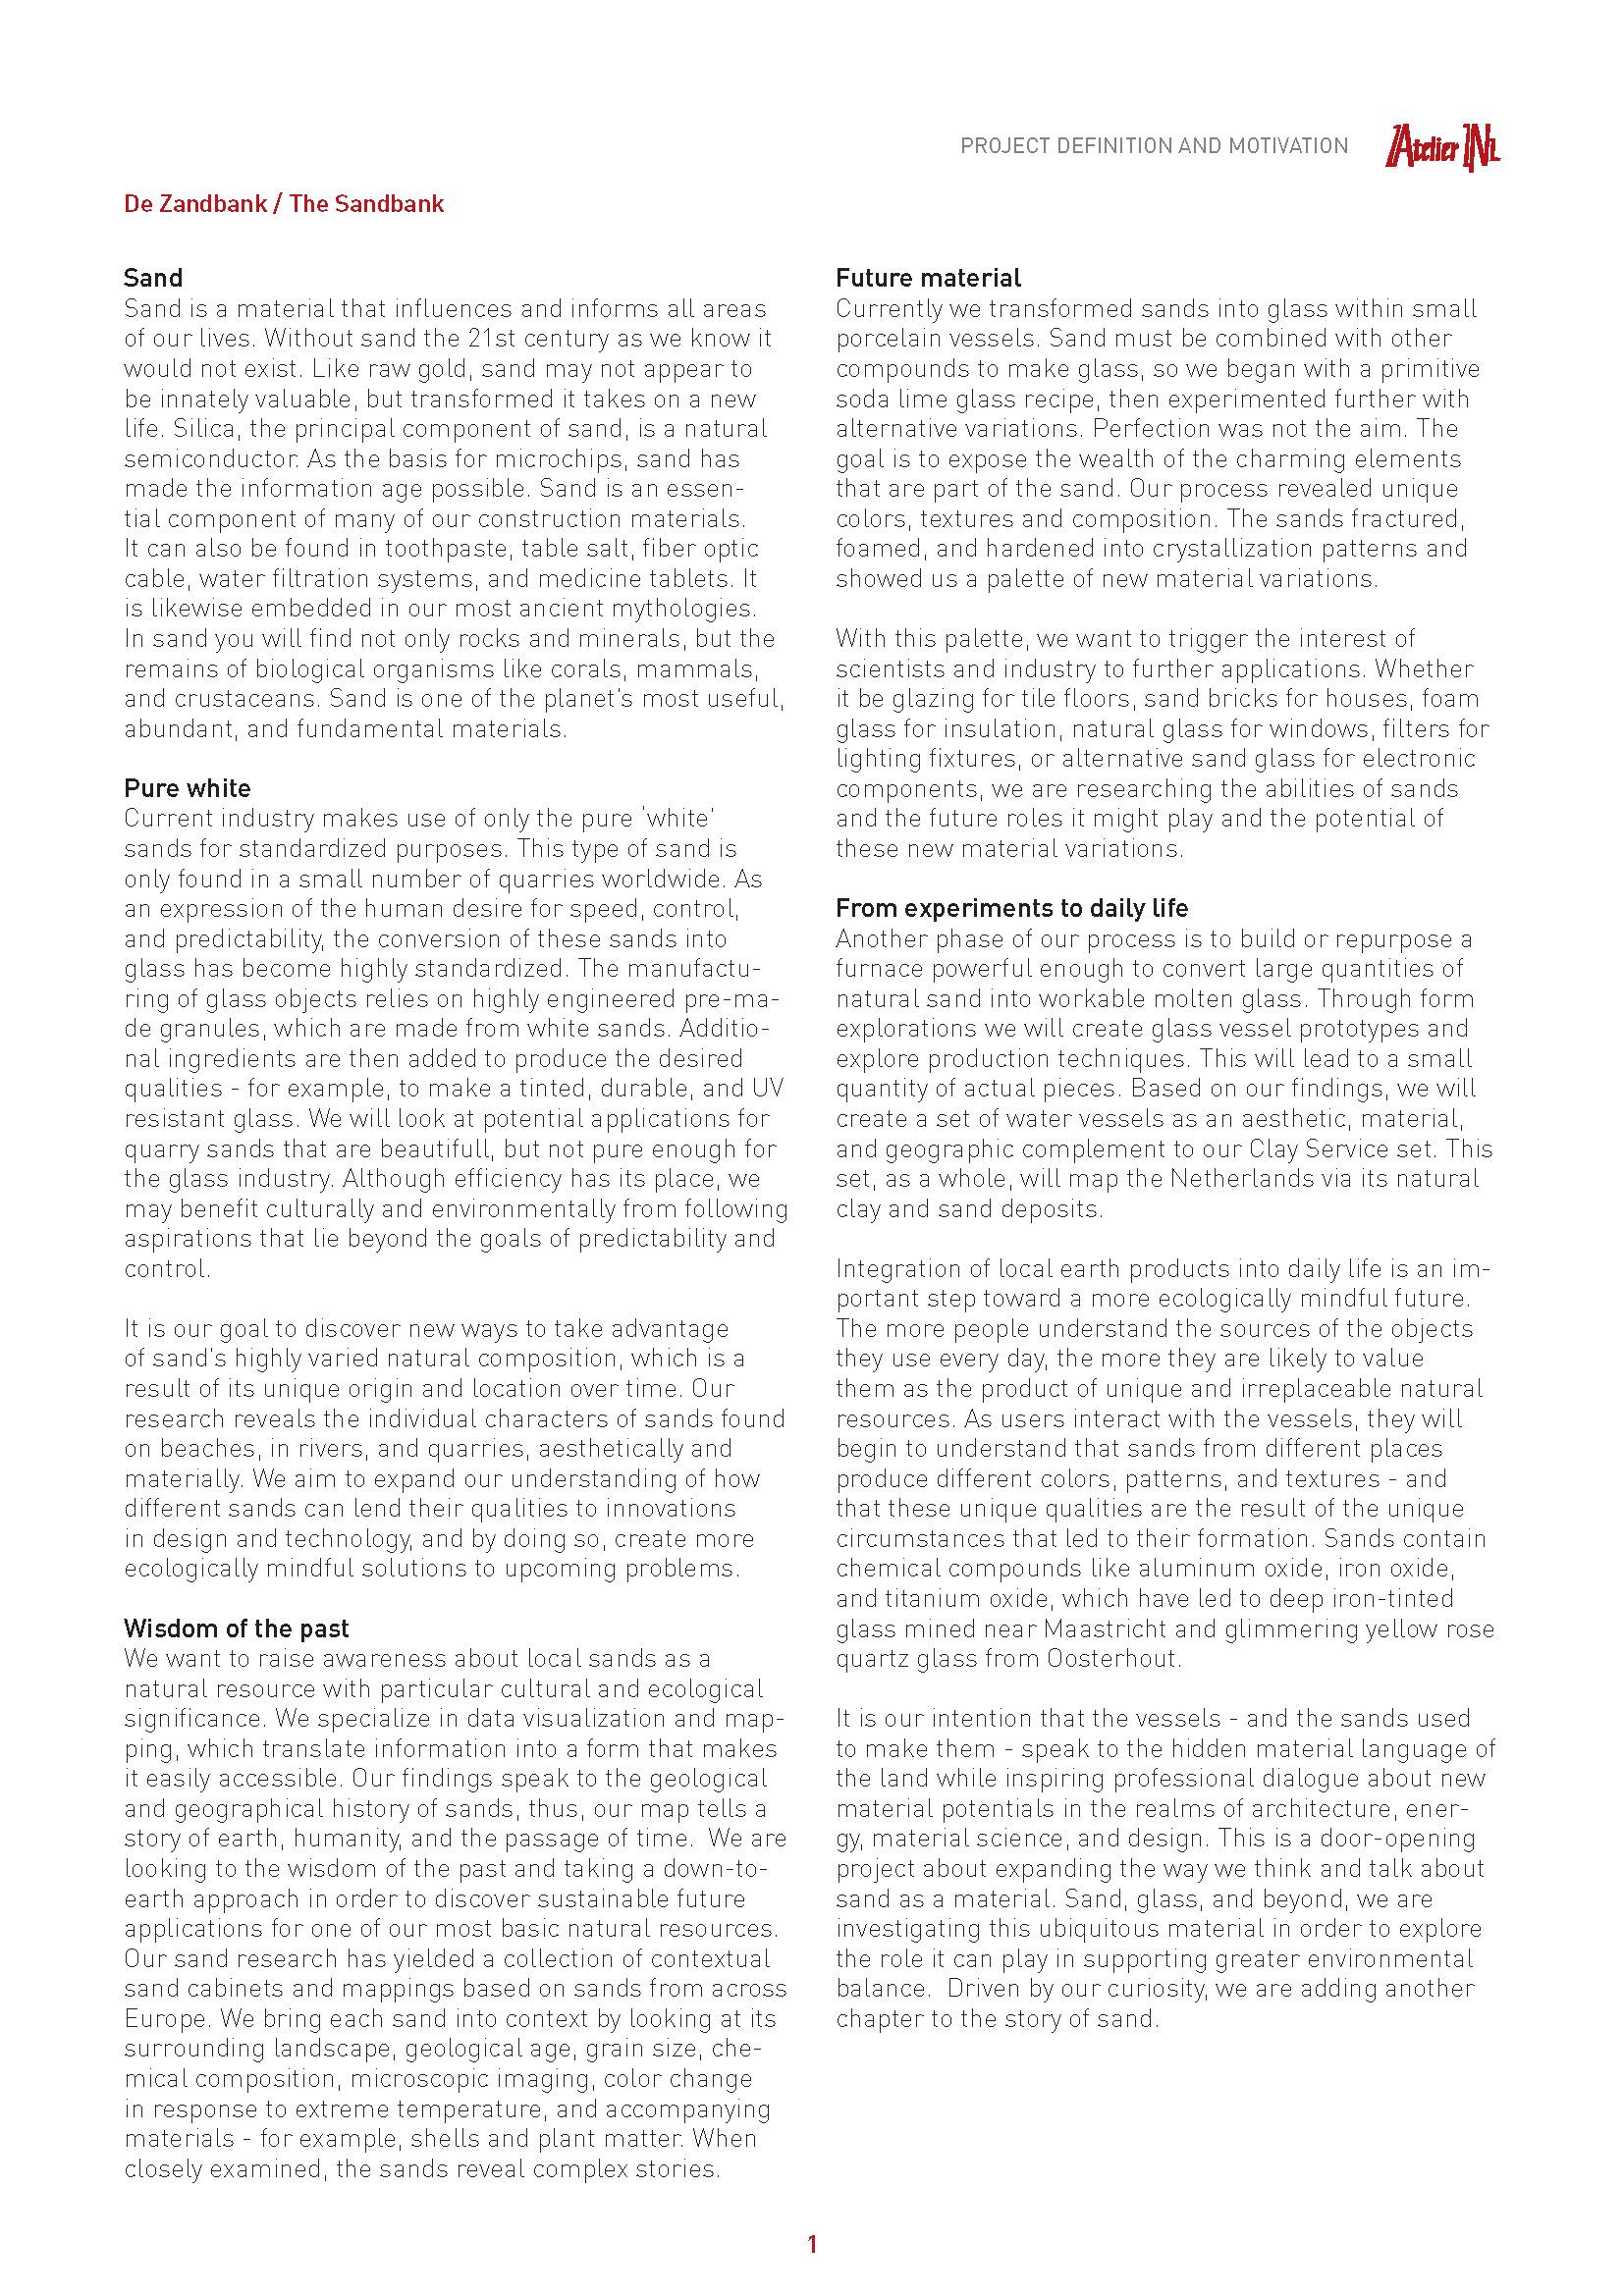 Material_last version_Page_1.jpg